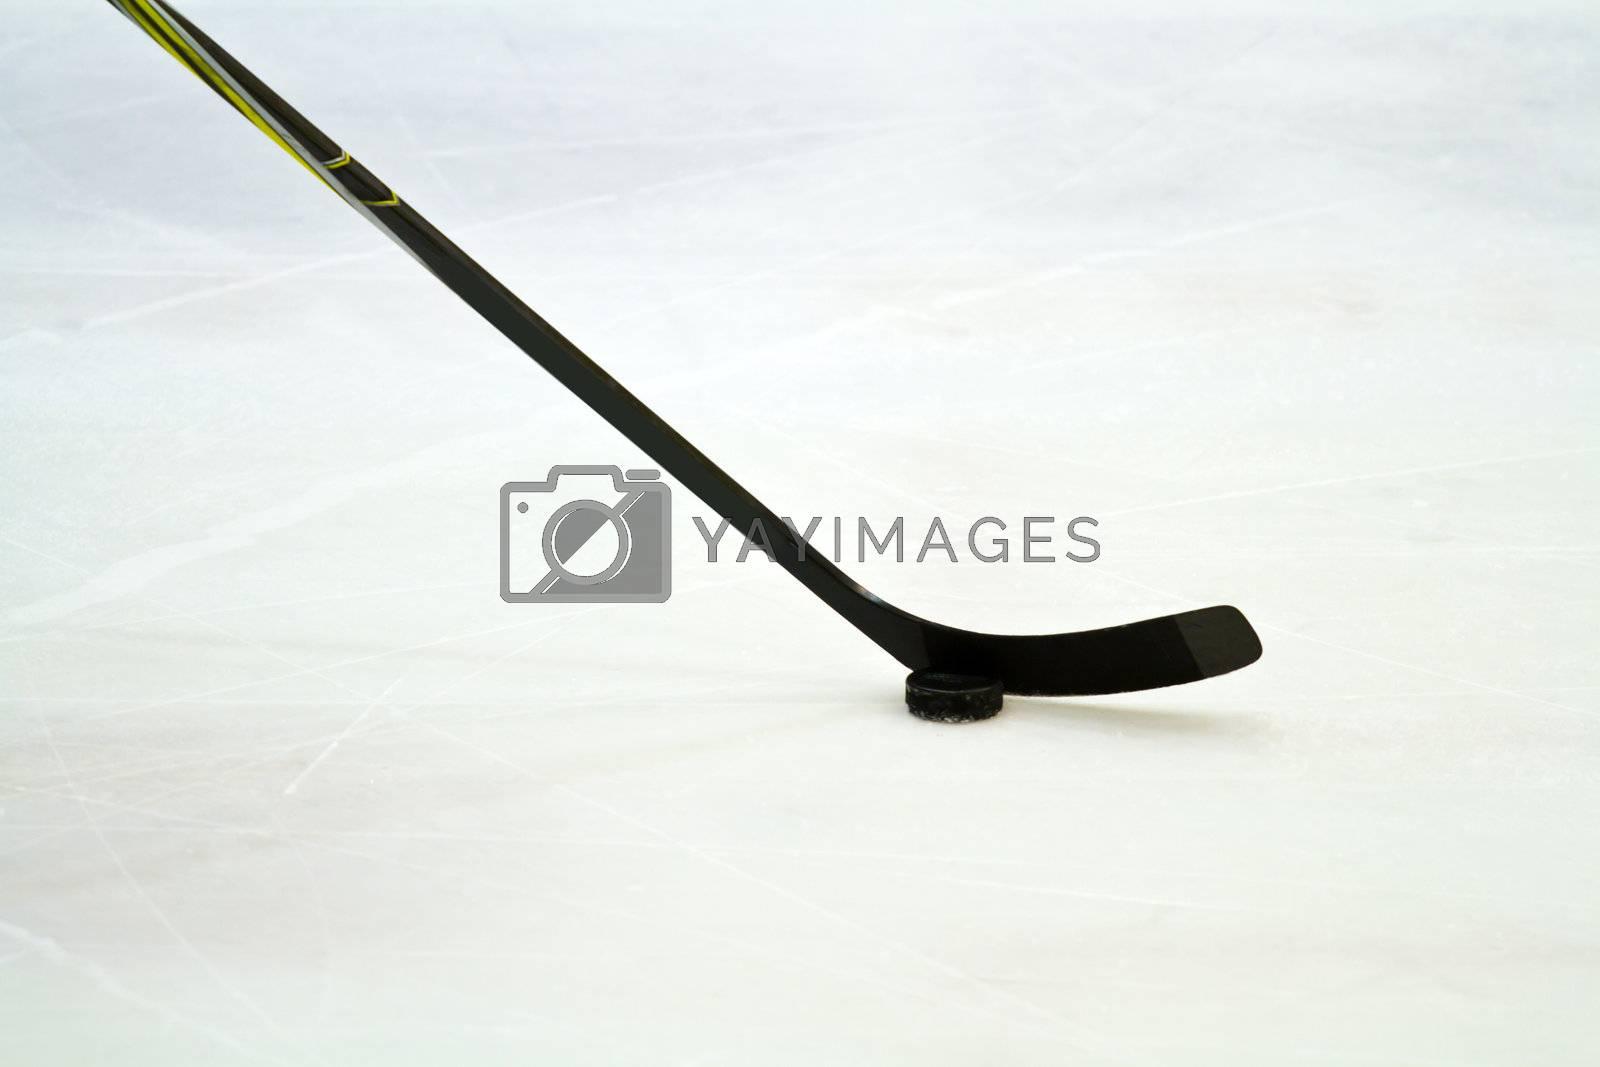 Royalty free image of hockey stick by lsantilli